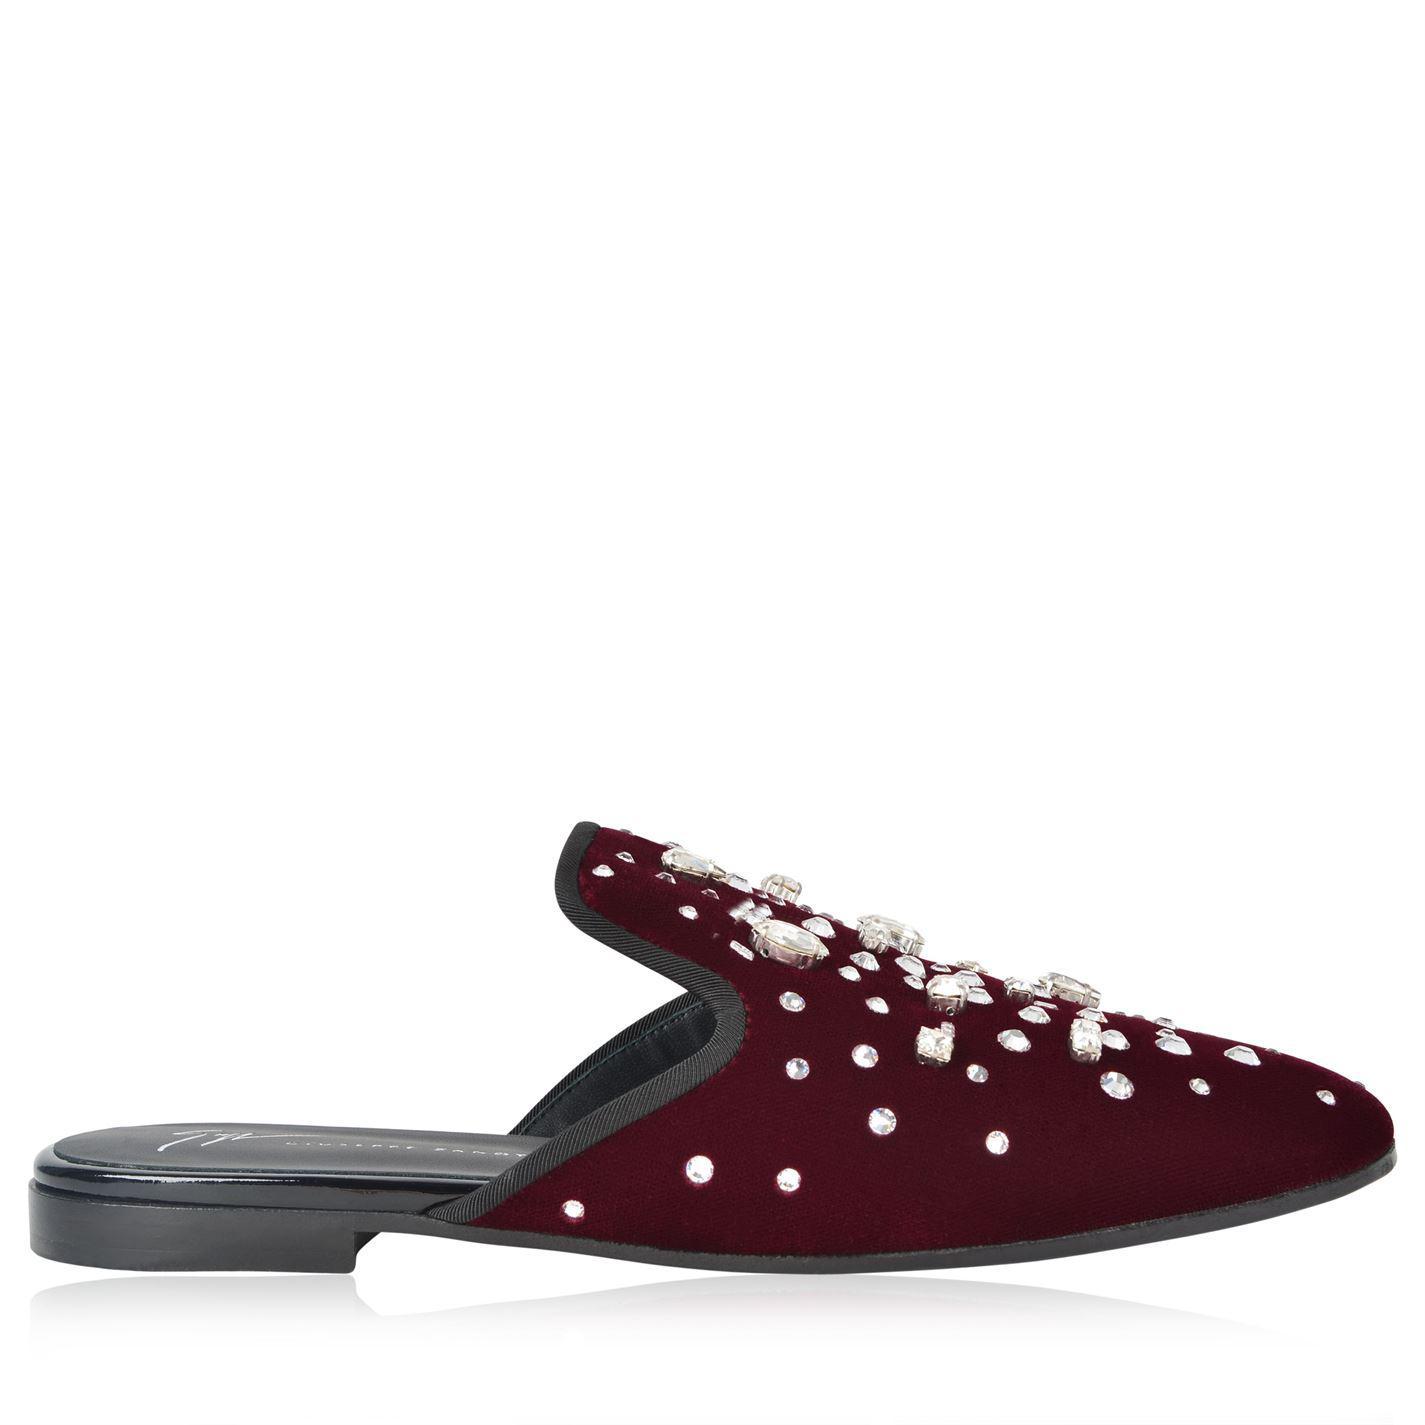 Nine West Kano Women's Heels NATM Size 6.5 M